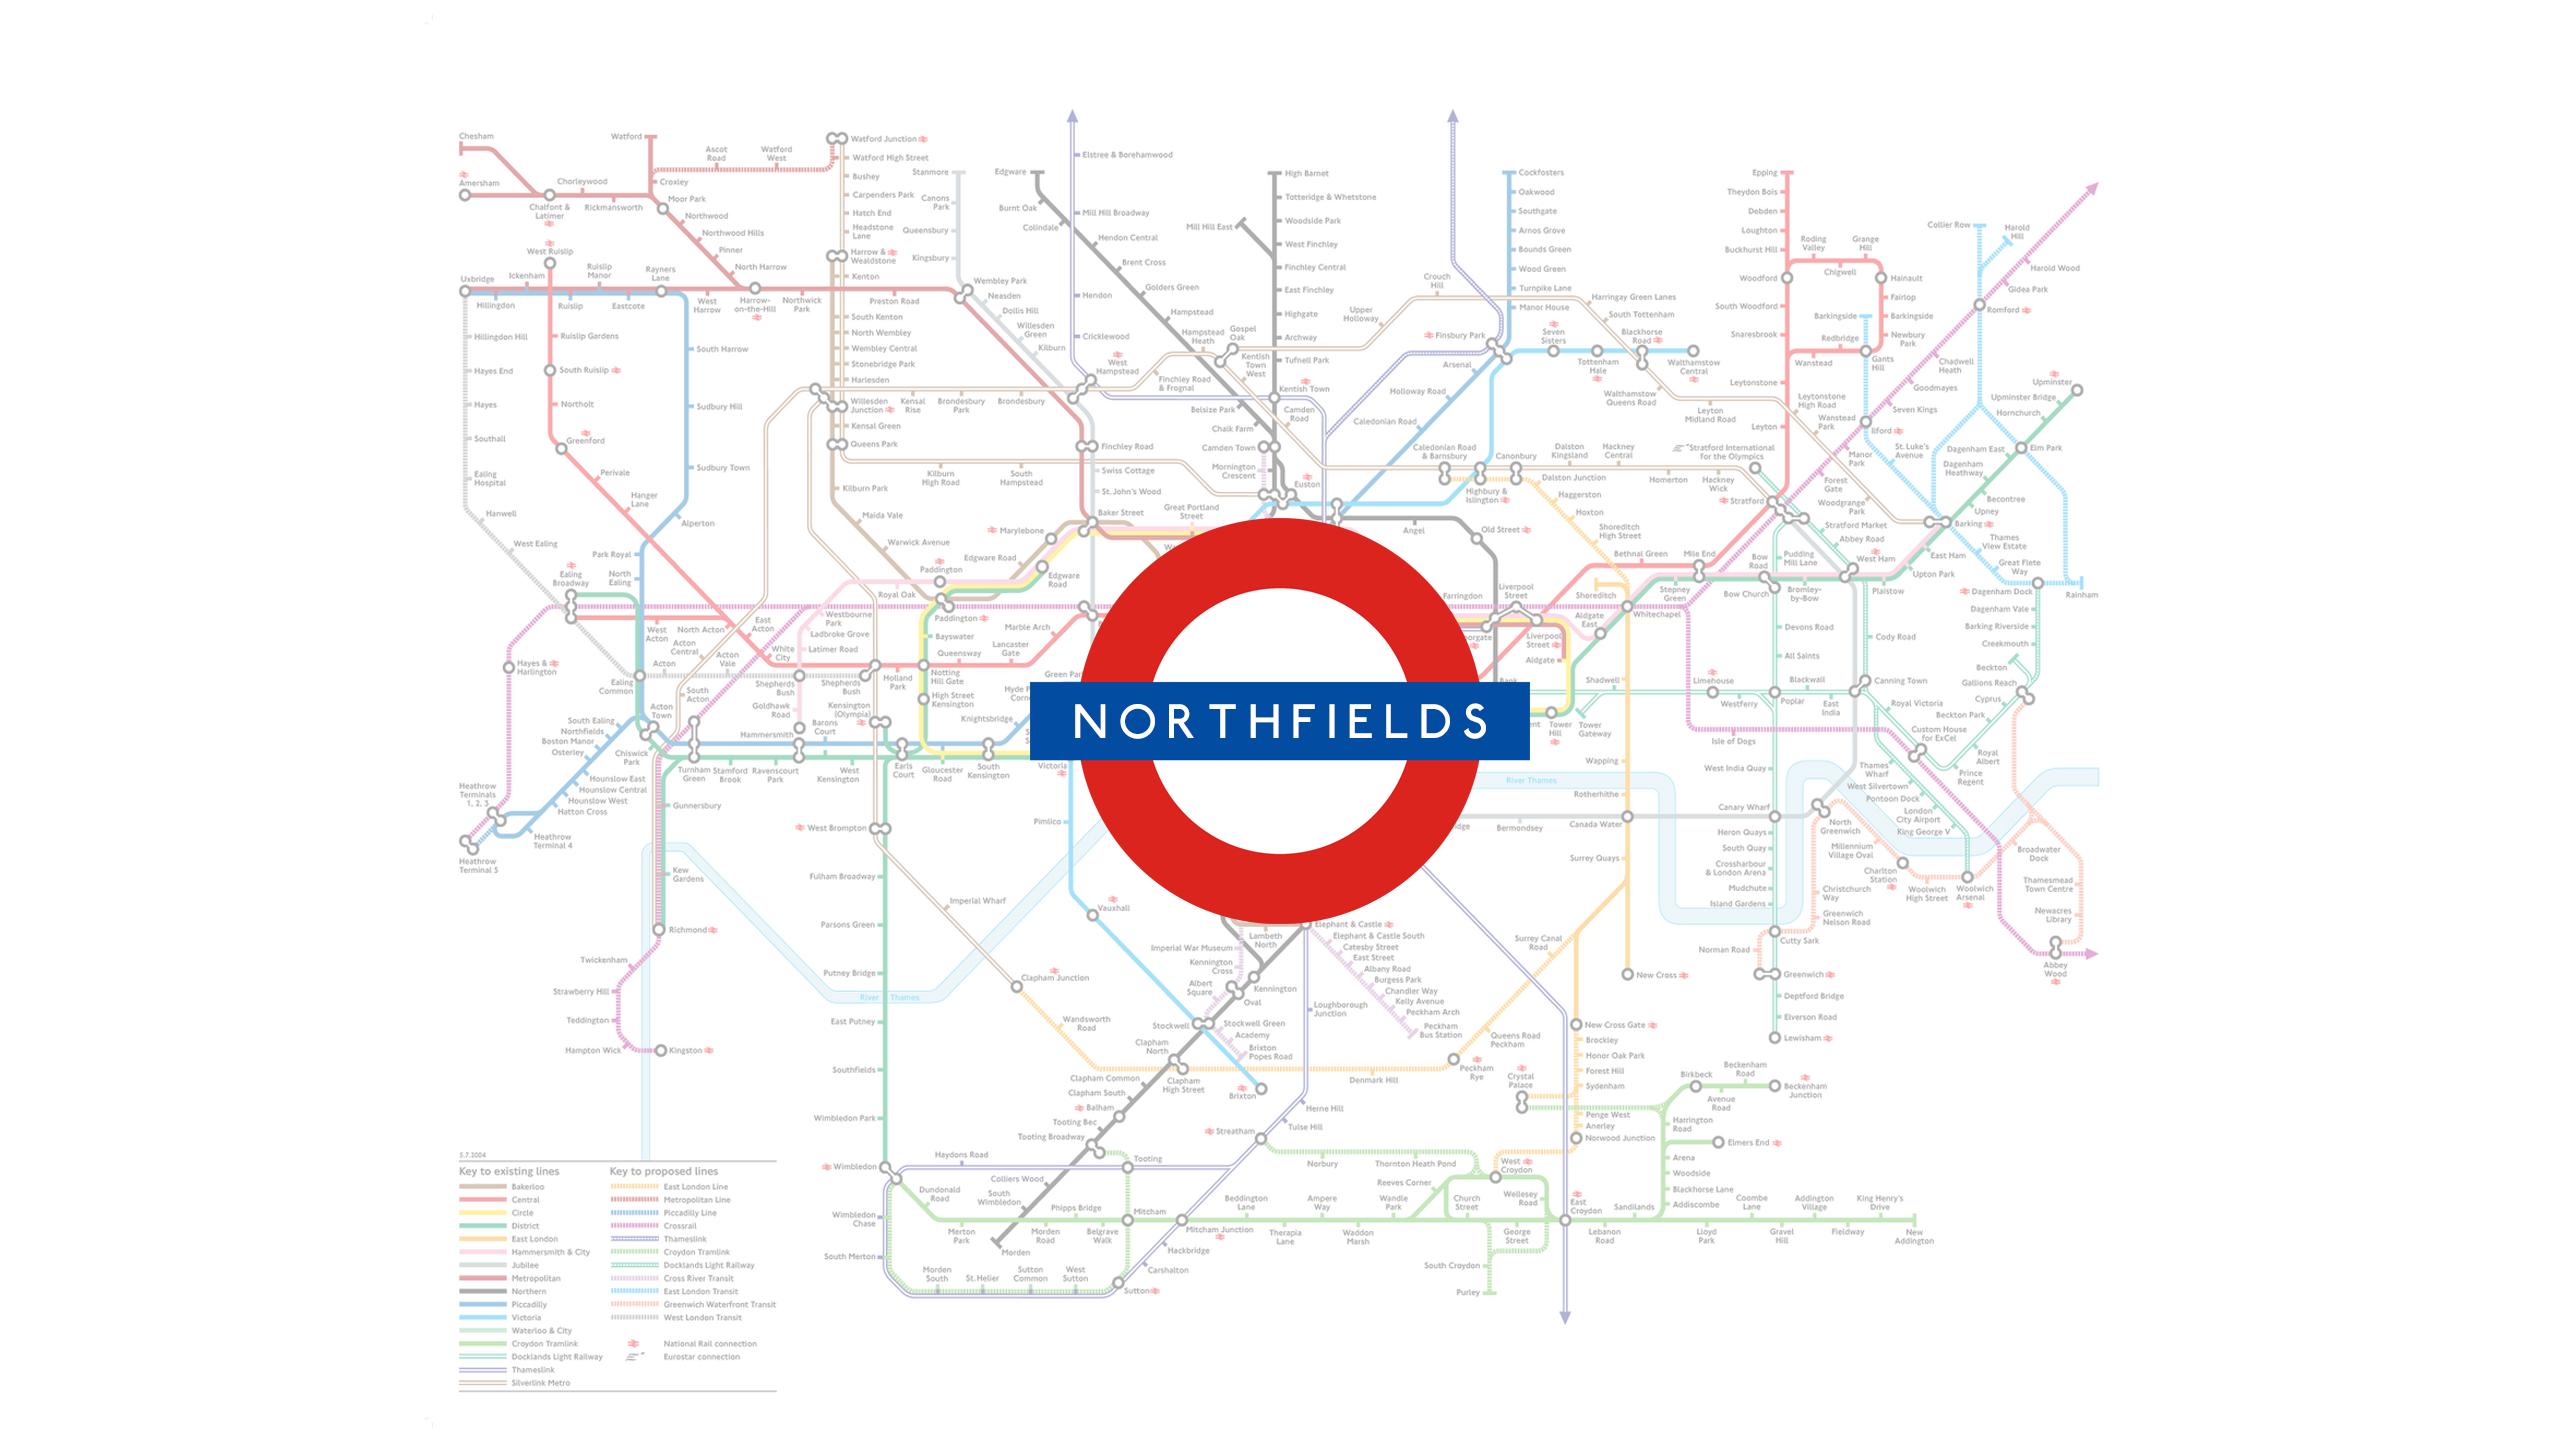 Northfields (Map)